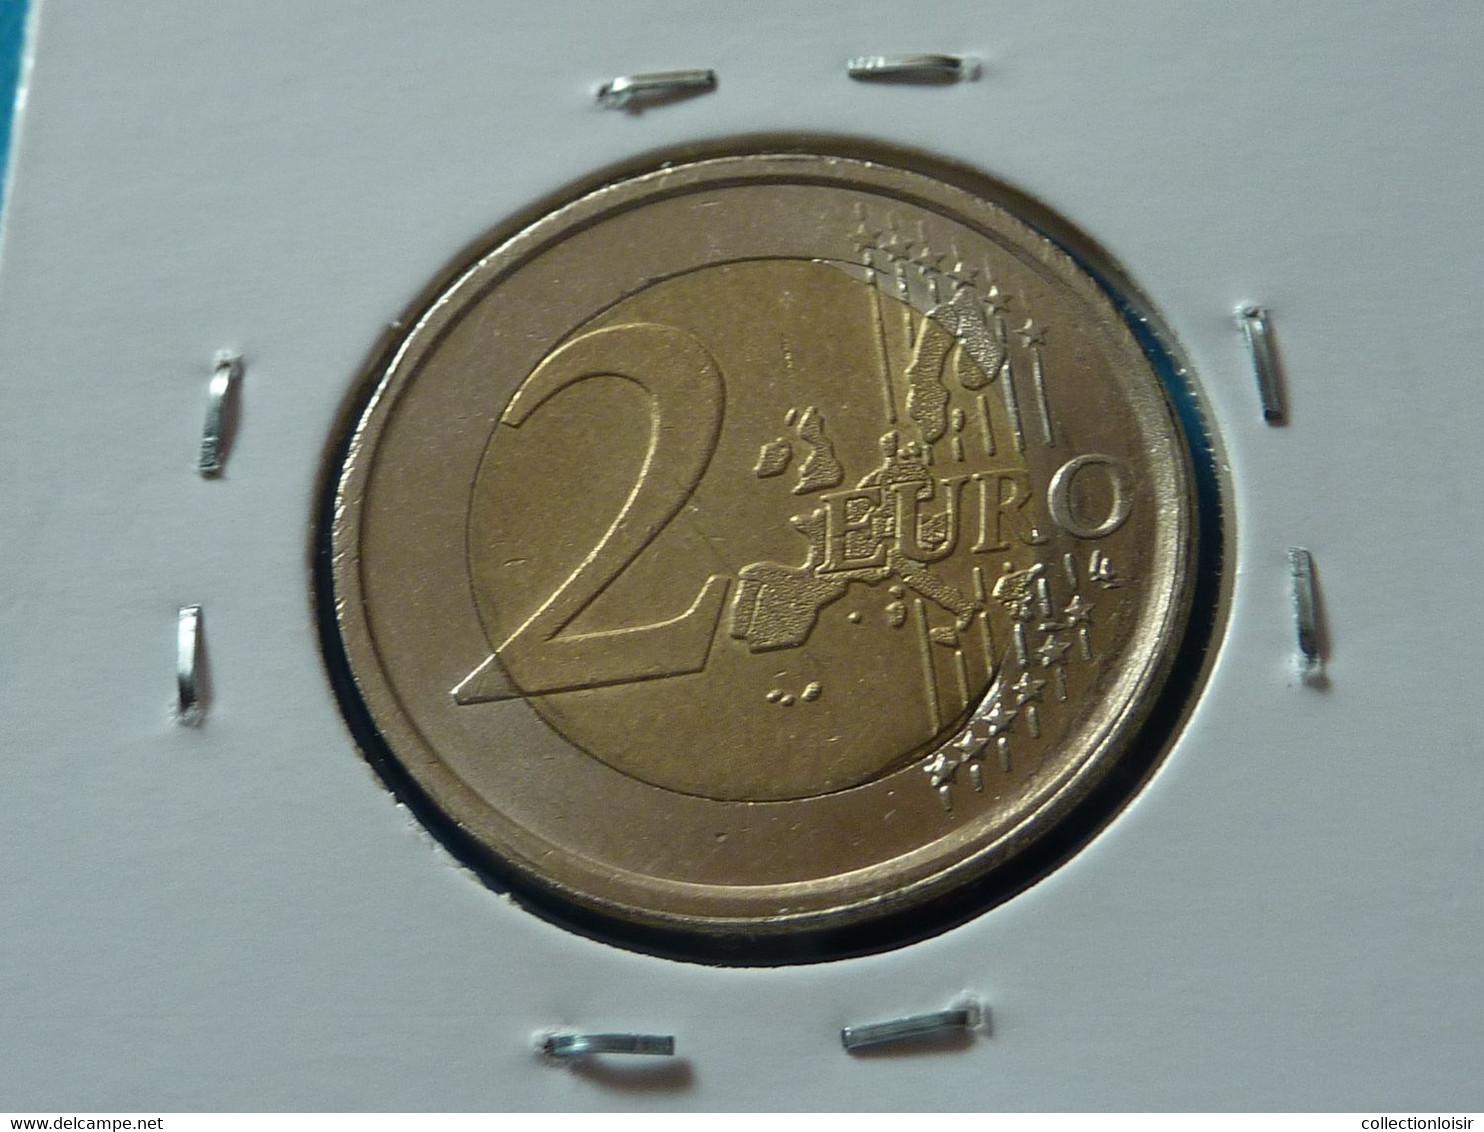 FAUTEE ***  2 EURO ITALIE 2005  ( 6 Photos ) - Errors And Oddities